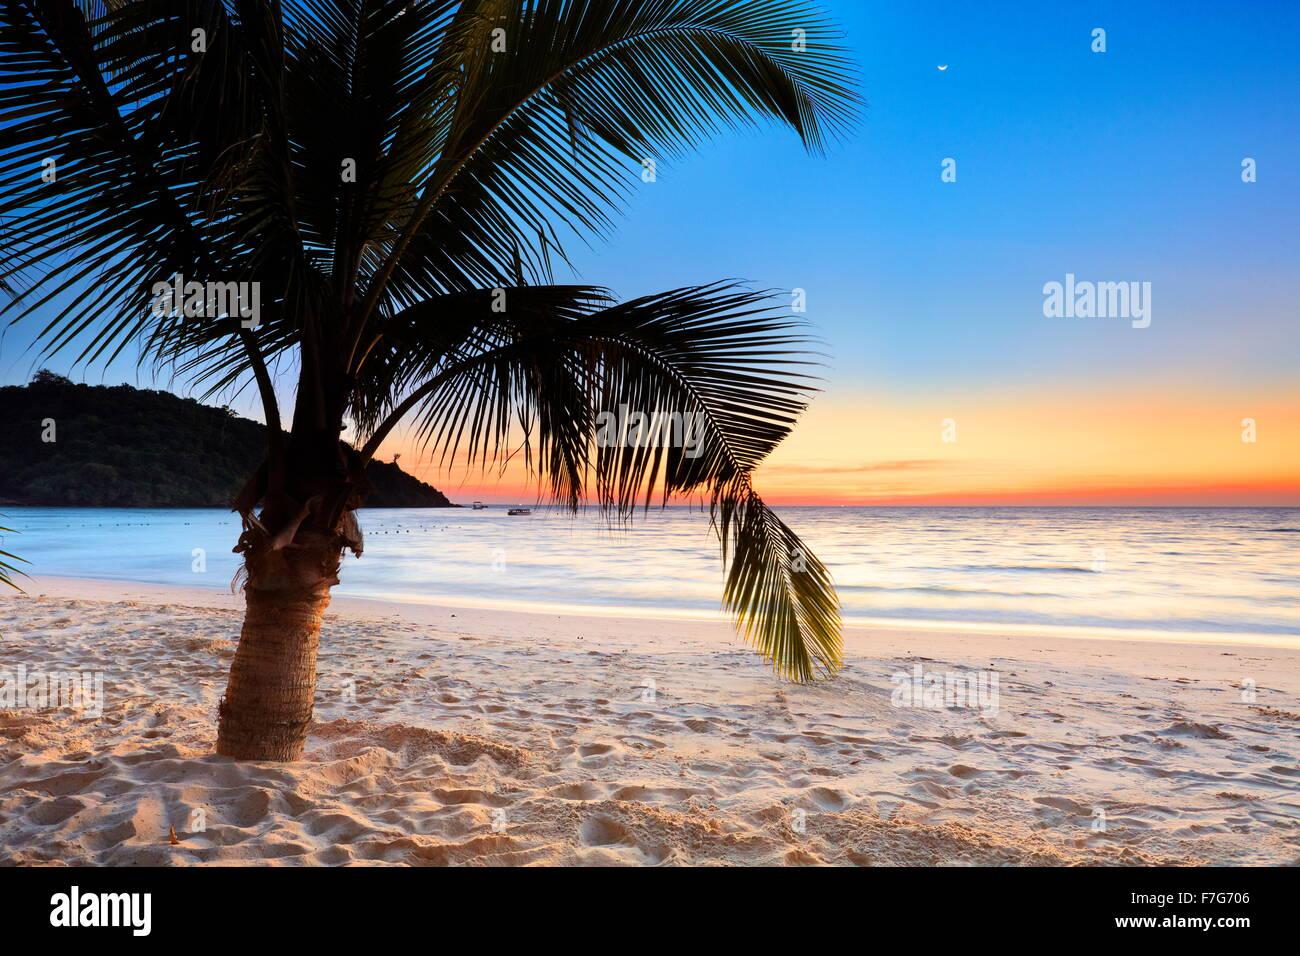 Tropischer Strand nach Sonnenuntergang, Ko Samet Insel, Thailand Stockbild